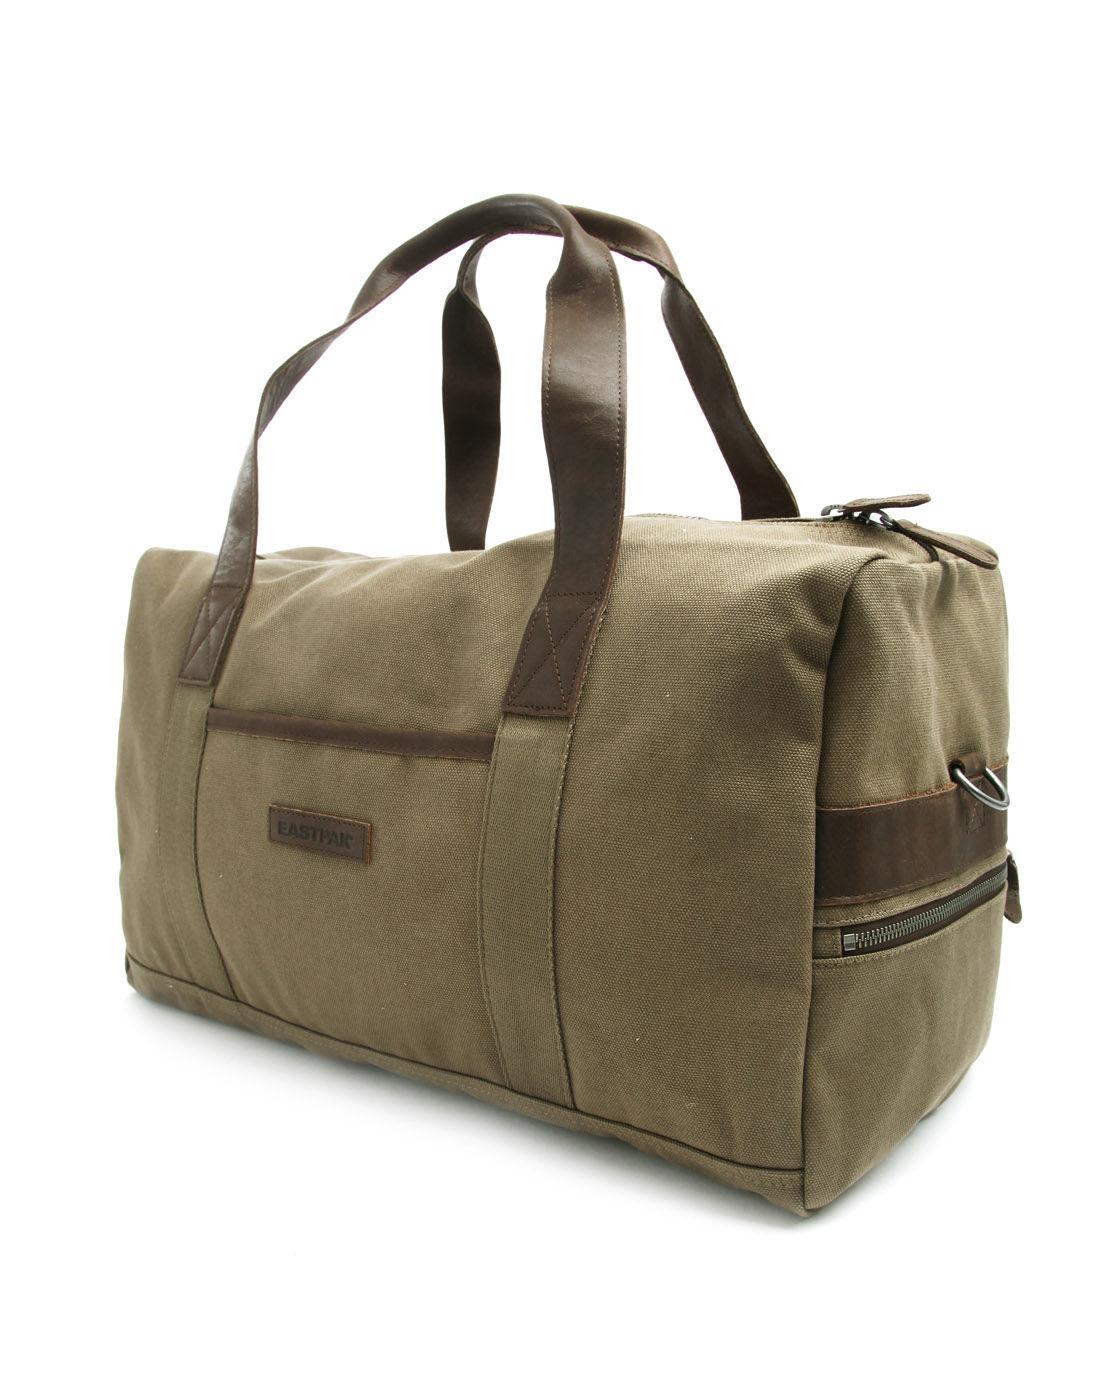 Eastpak Welder Khaki Weekend Bag in Khaki for Men